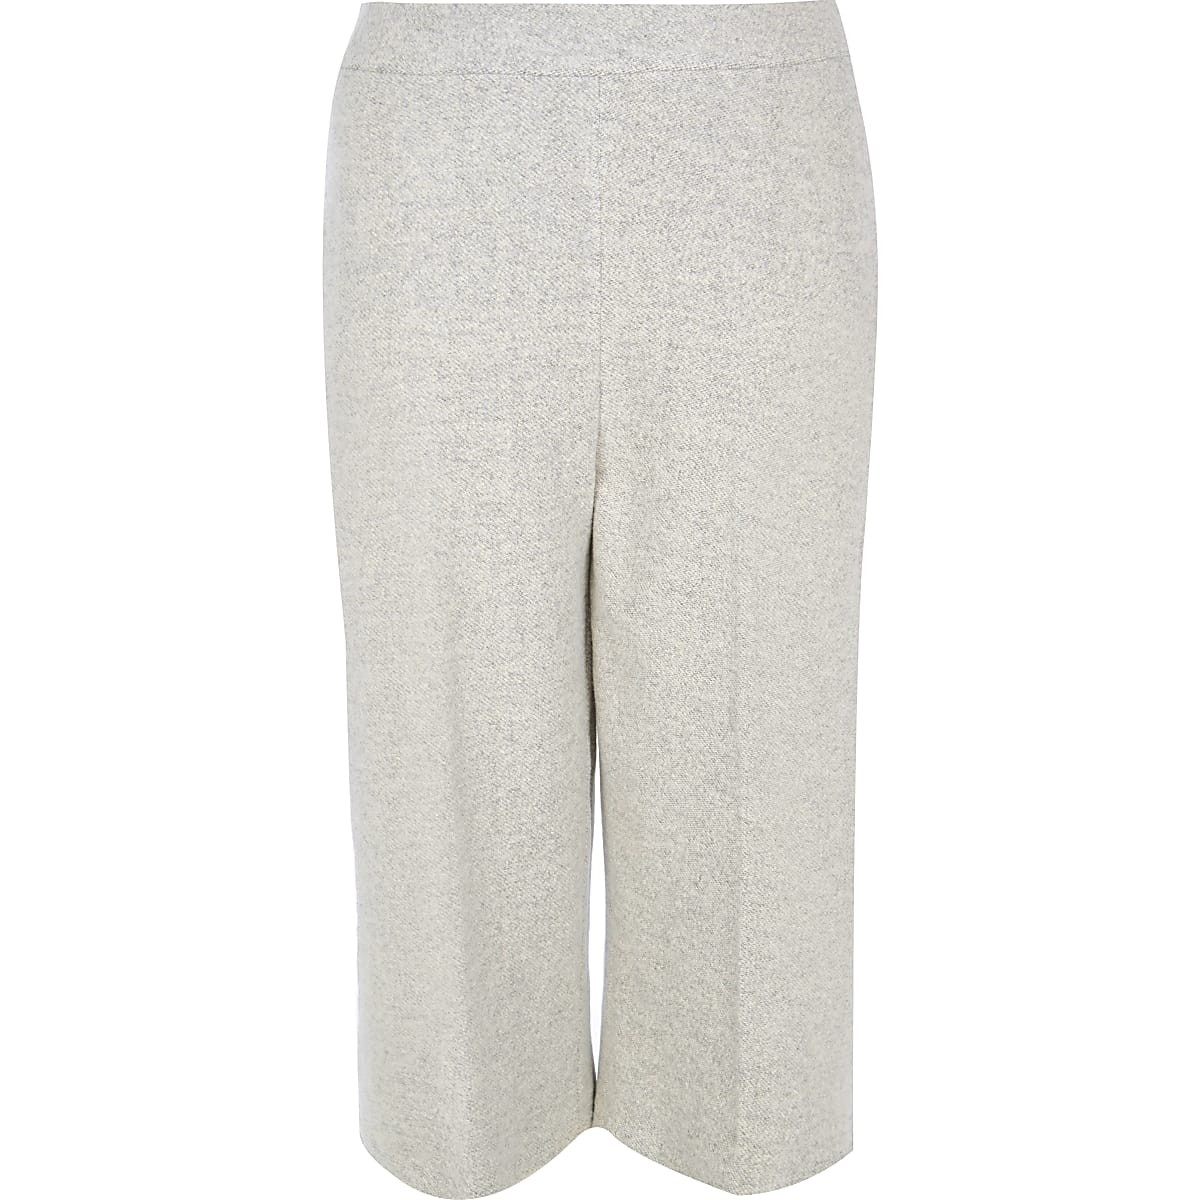 Plus light grey knit cropped pants